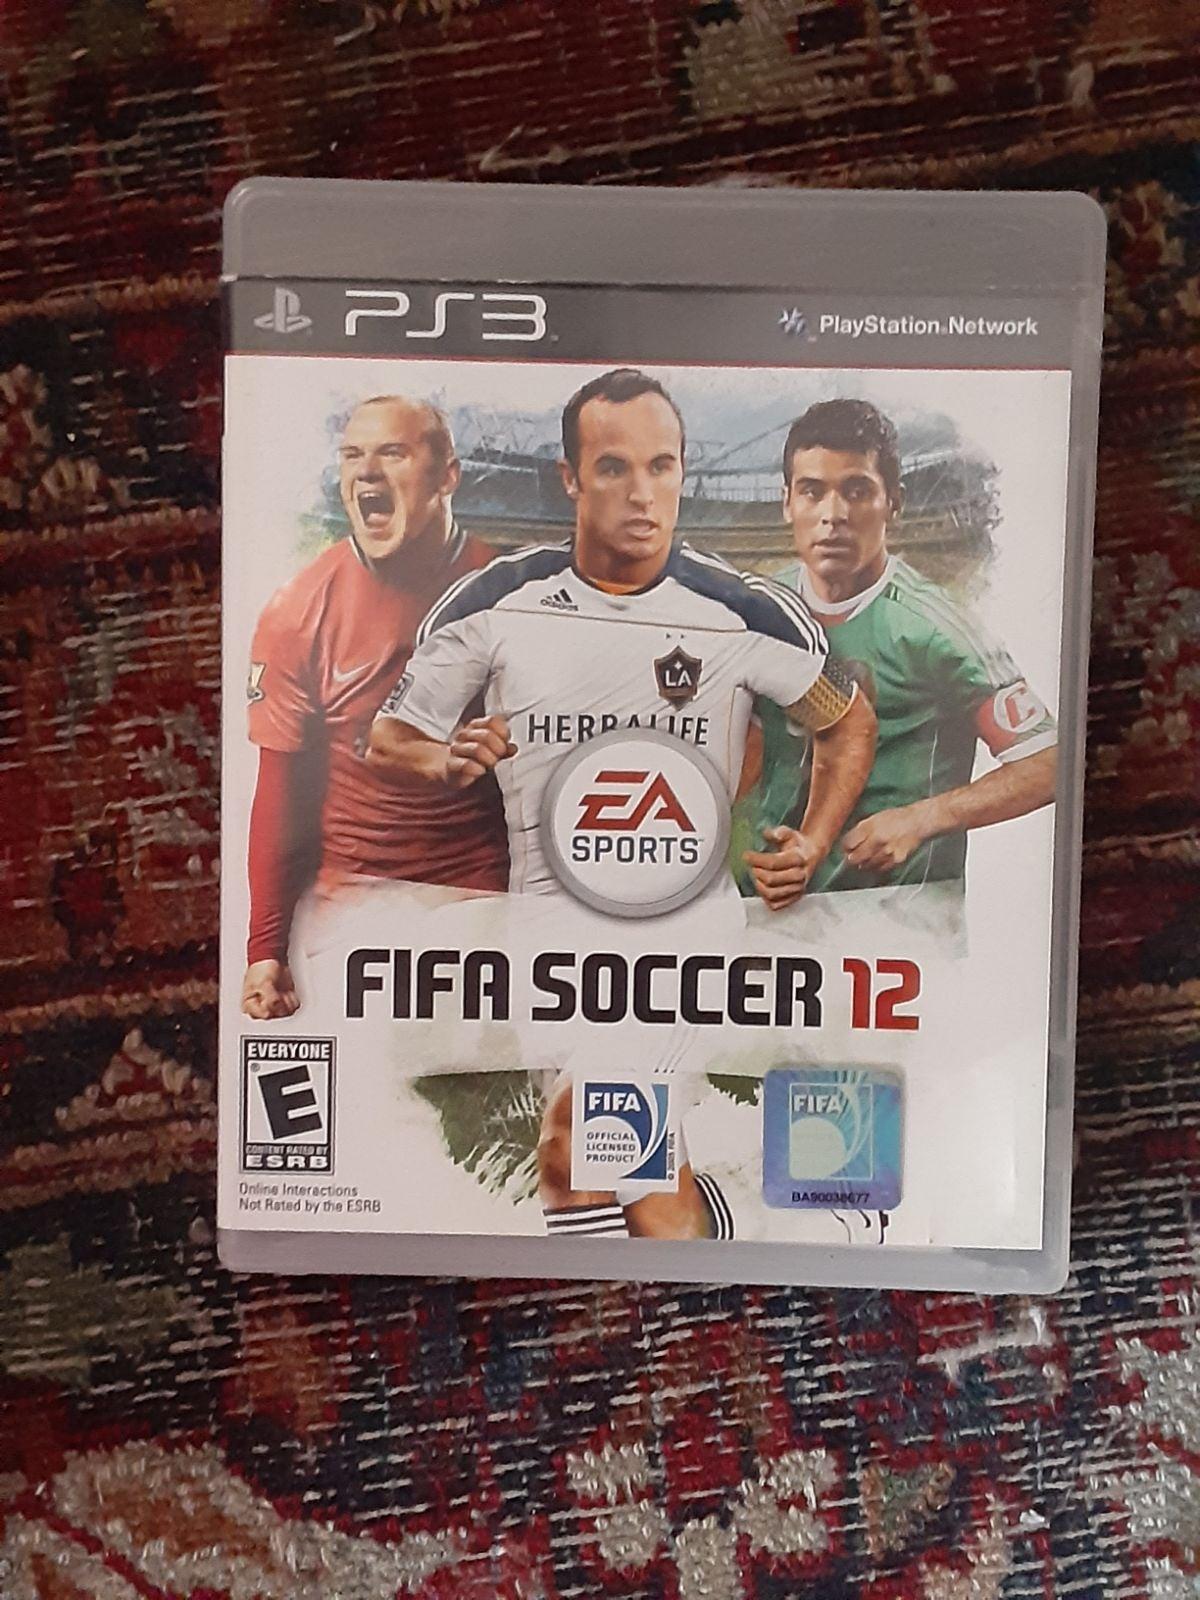 Fifa soccer on PS3